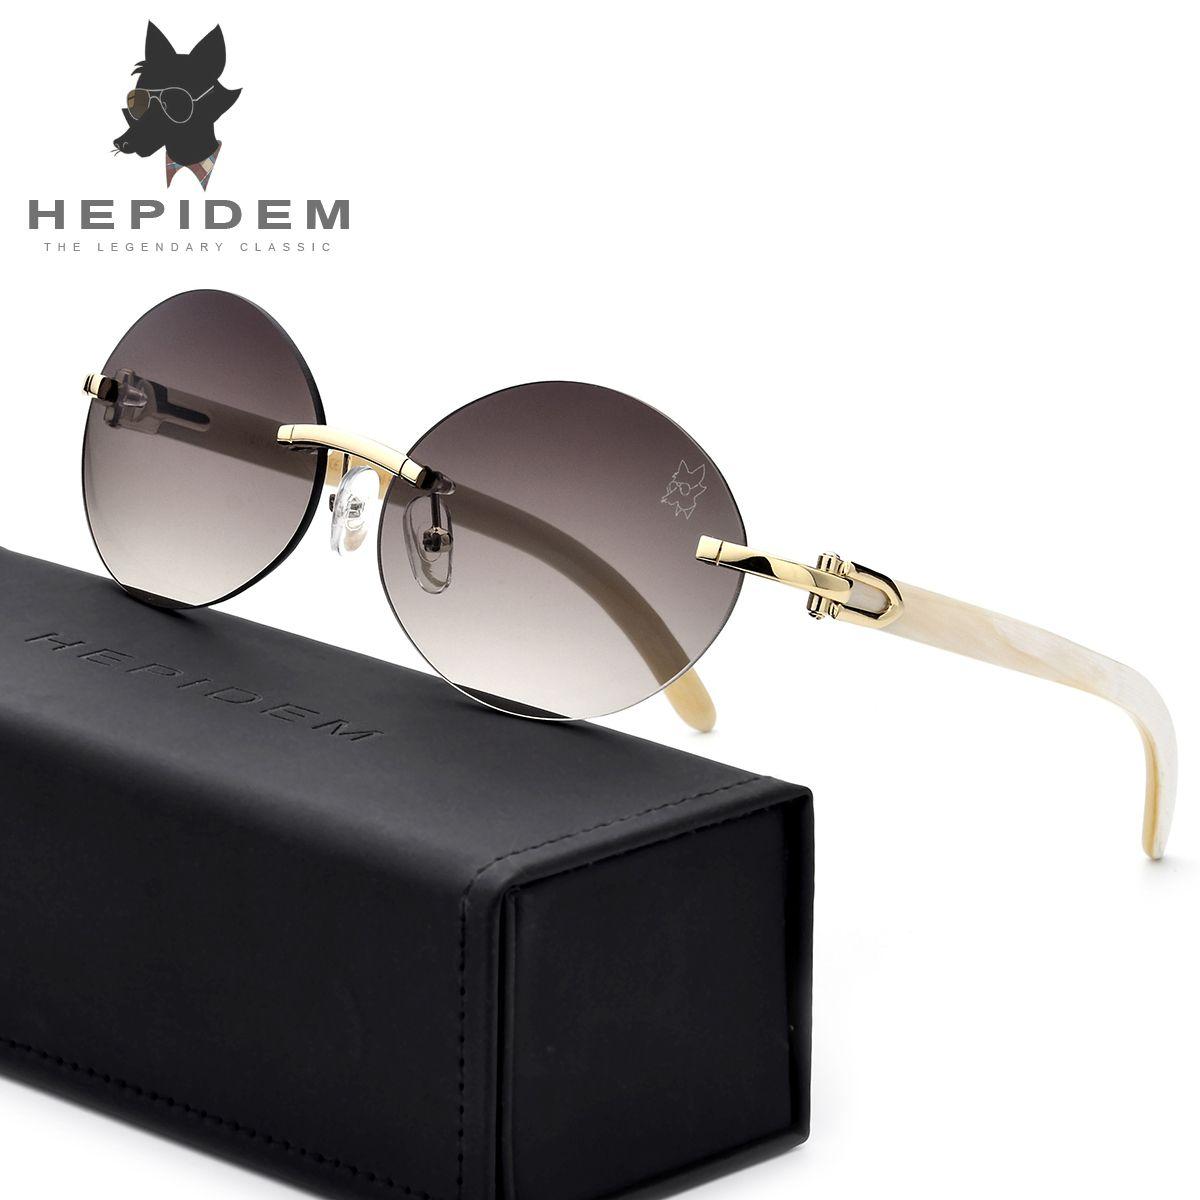 766199a4c52e3 HEPIDEM 2018 Buffalo Horn Carter Men Round SunglassesUS  72.22 manfashion   fashion  trendfashion  freeshiping  aliexpress  alie